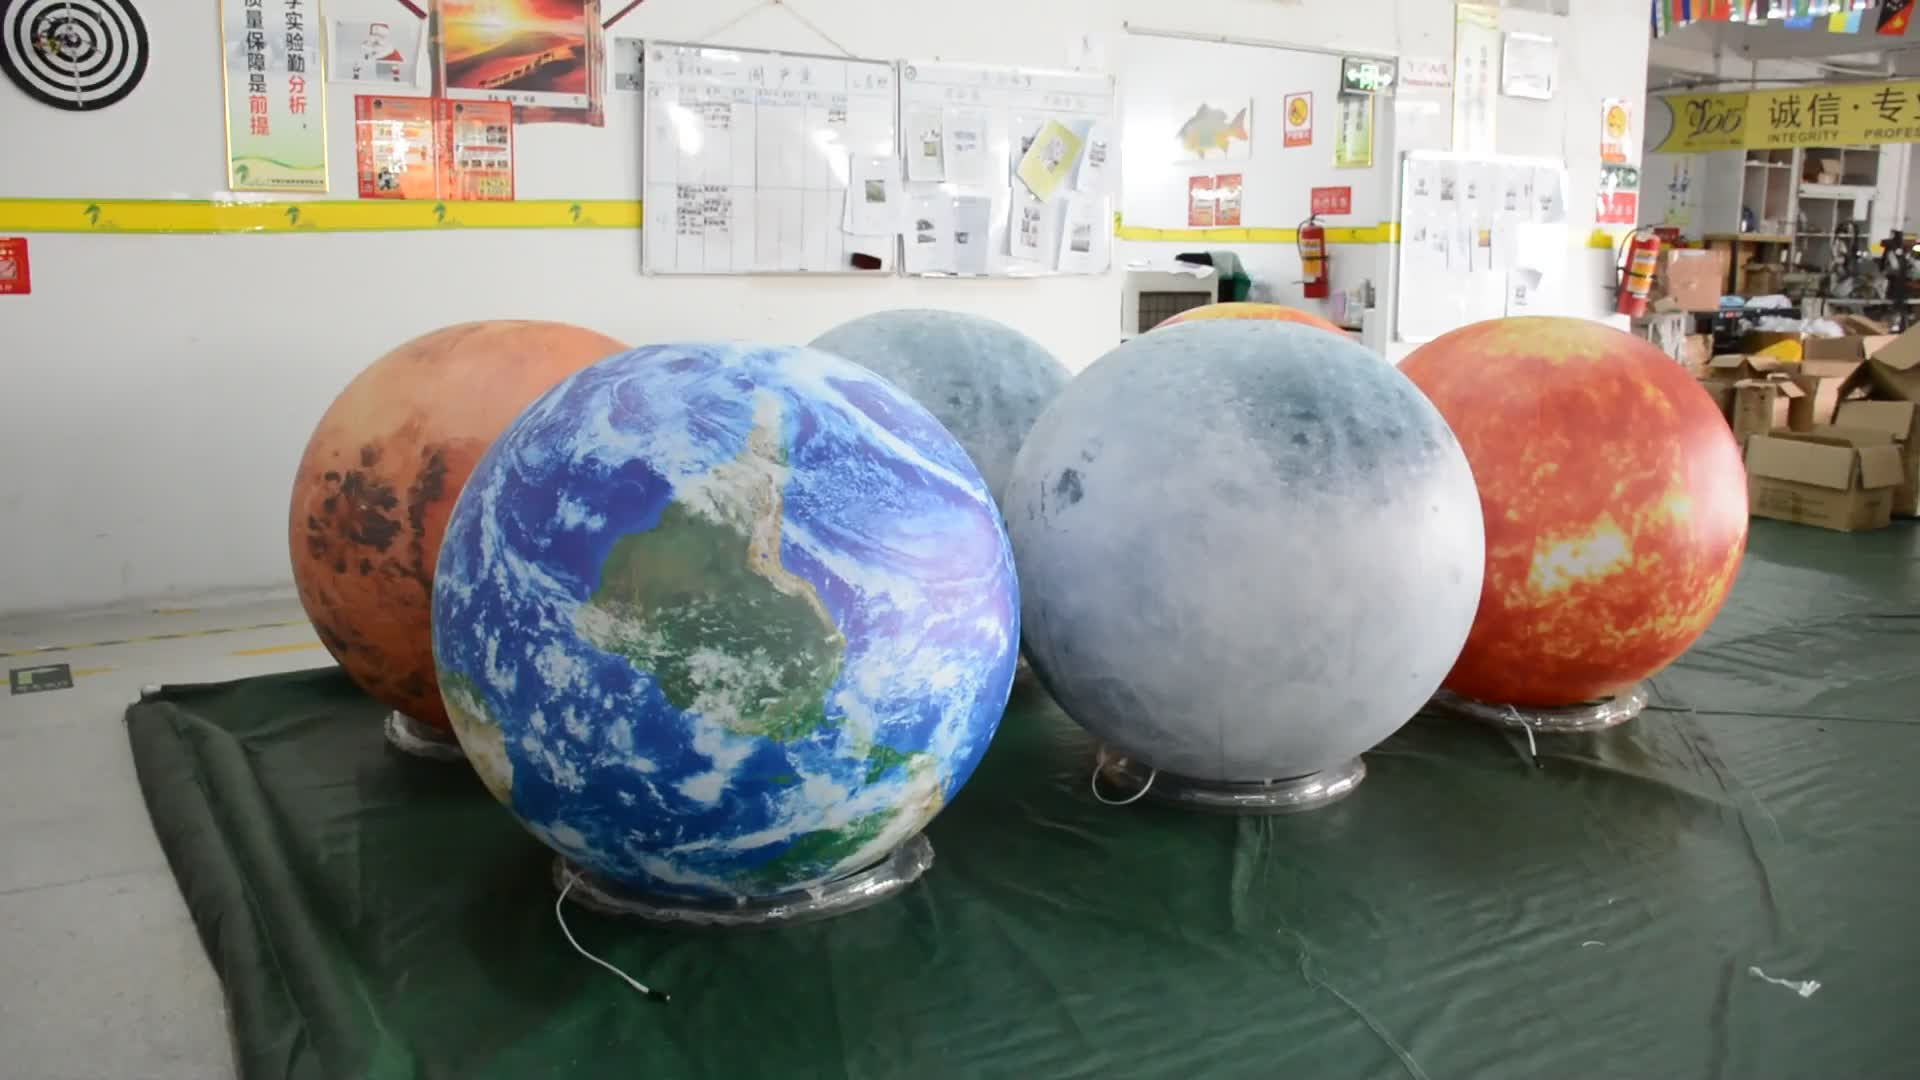 Dia 2 เมตร PVC Inflatable Beach Ball โฆษณายักษ์ Globe ฮีเลียมบอลลูน 3d Planet